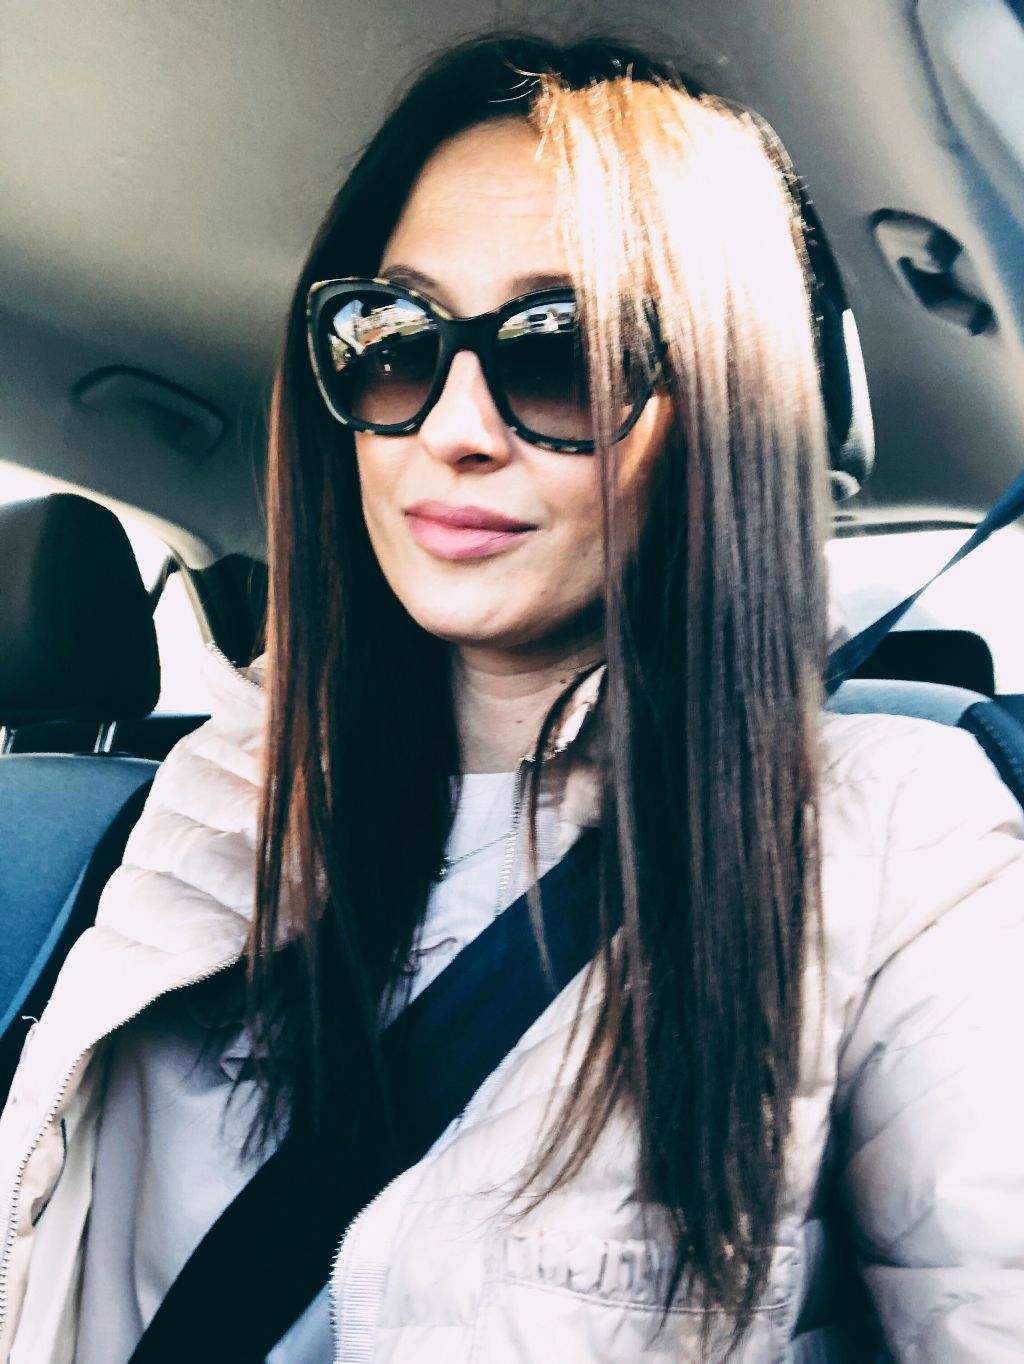 Hello world☀️🌈 #polishgirl #happy #weekend #sogood #me #pictureoftheday #portrait #longhair #brunette